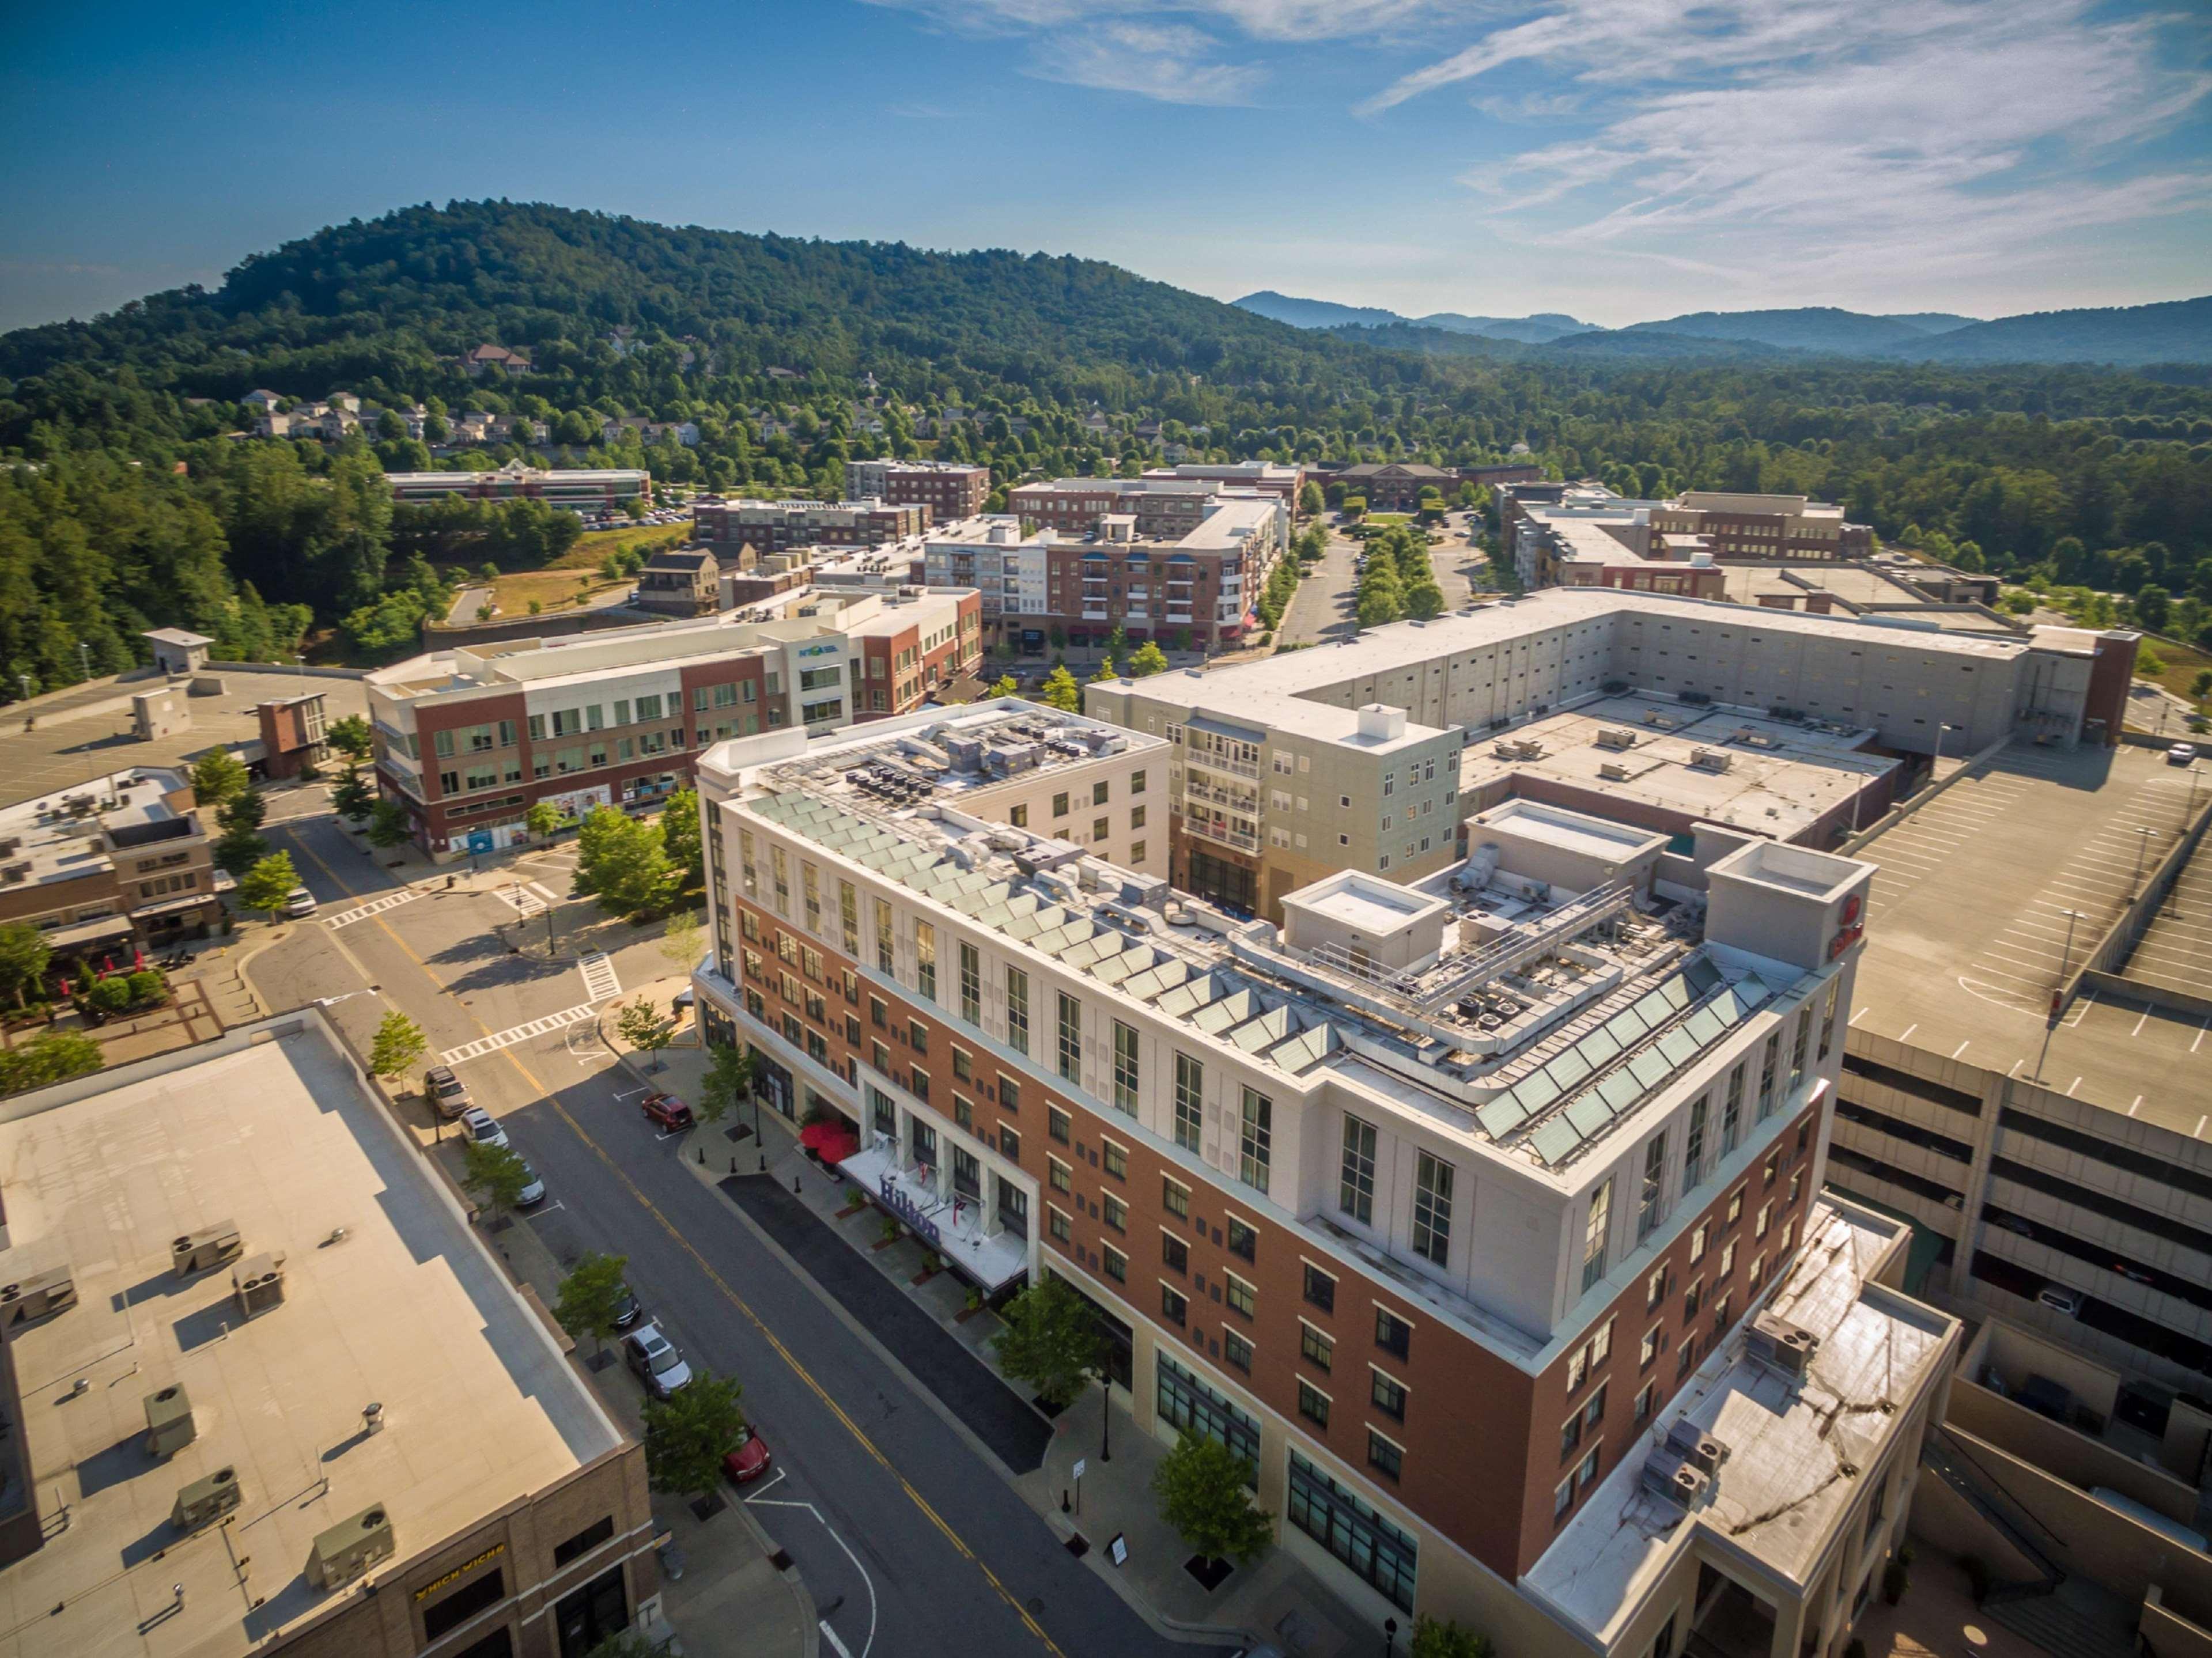 Hilton Asheville Biltmore Park image 35